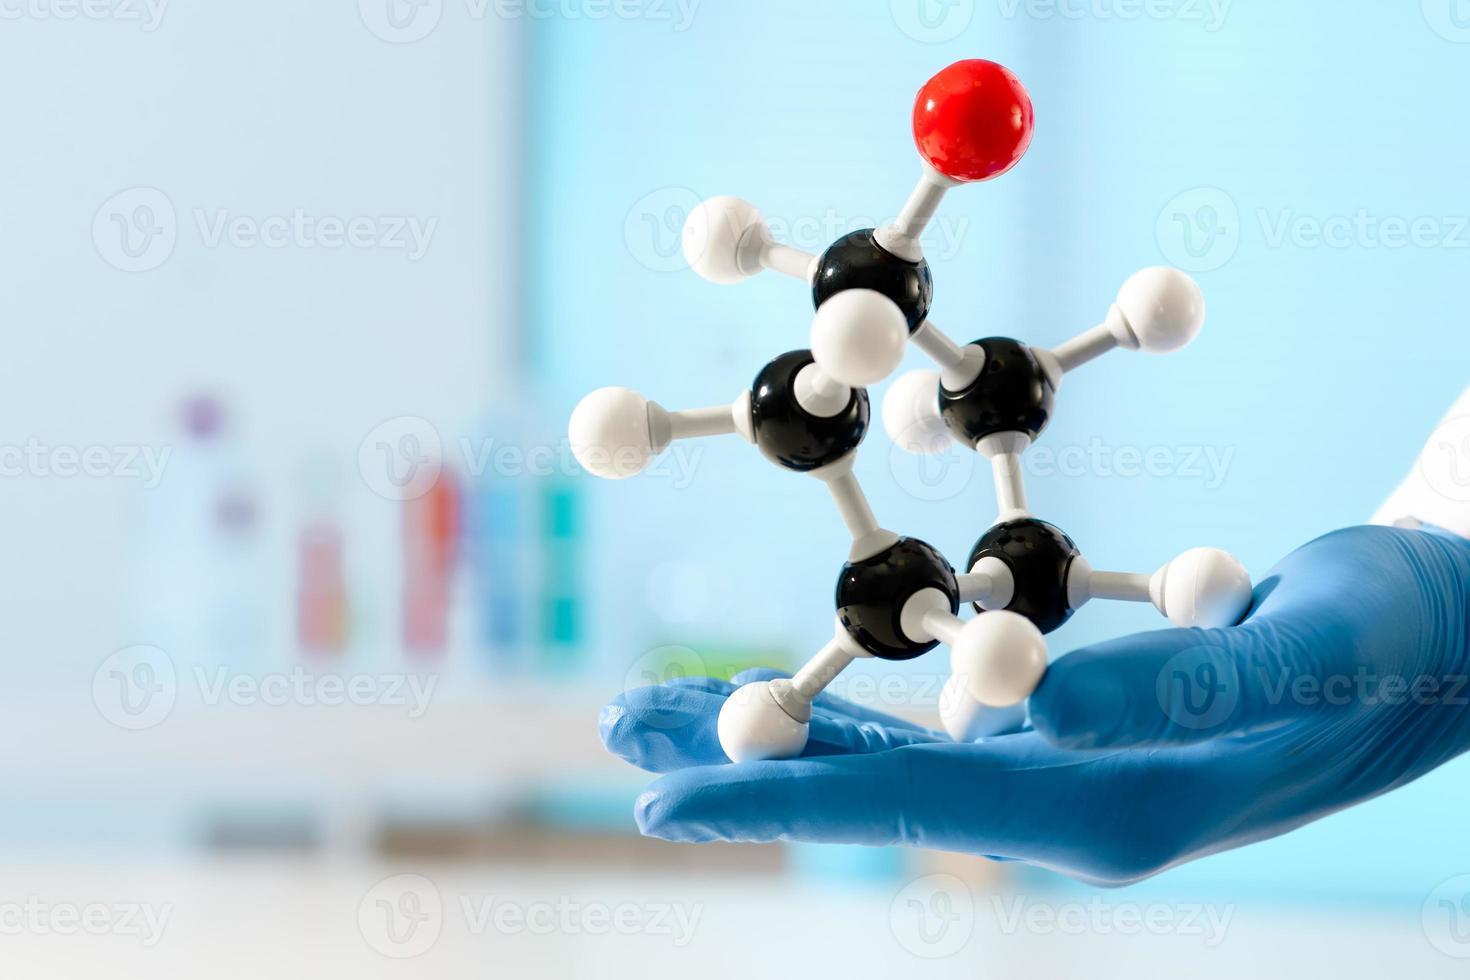 molekulare Struktur foto